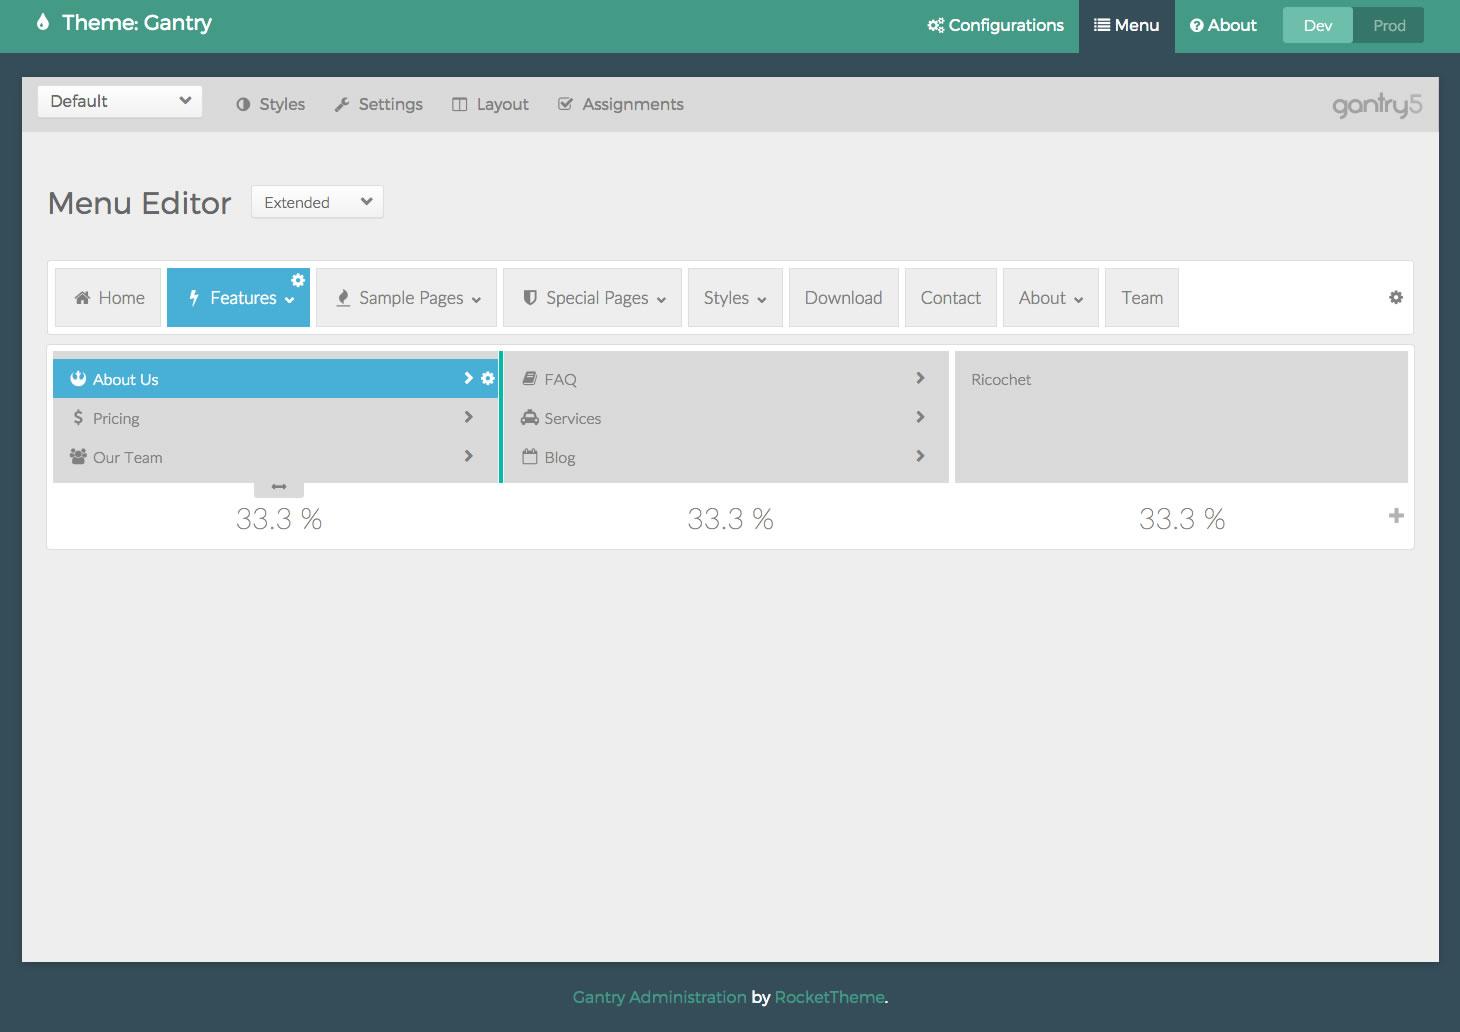 Gantry 5 menu editor